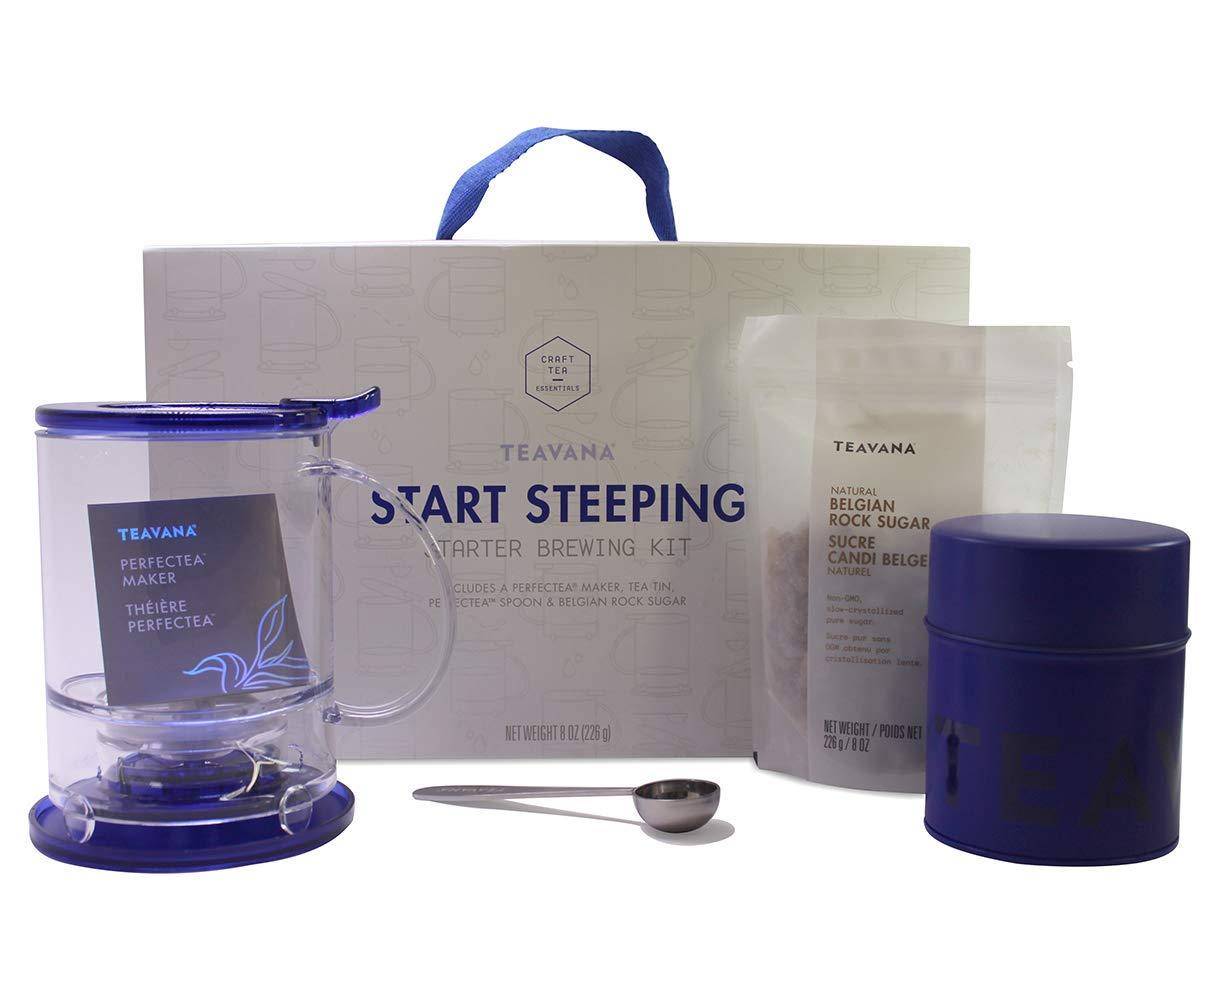 Teavana Start Steeping Starter Brewing Kit (with Blue Teamaker)